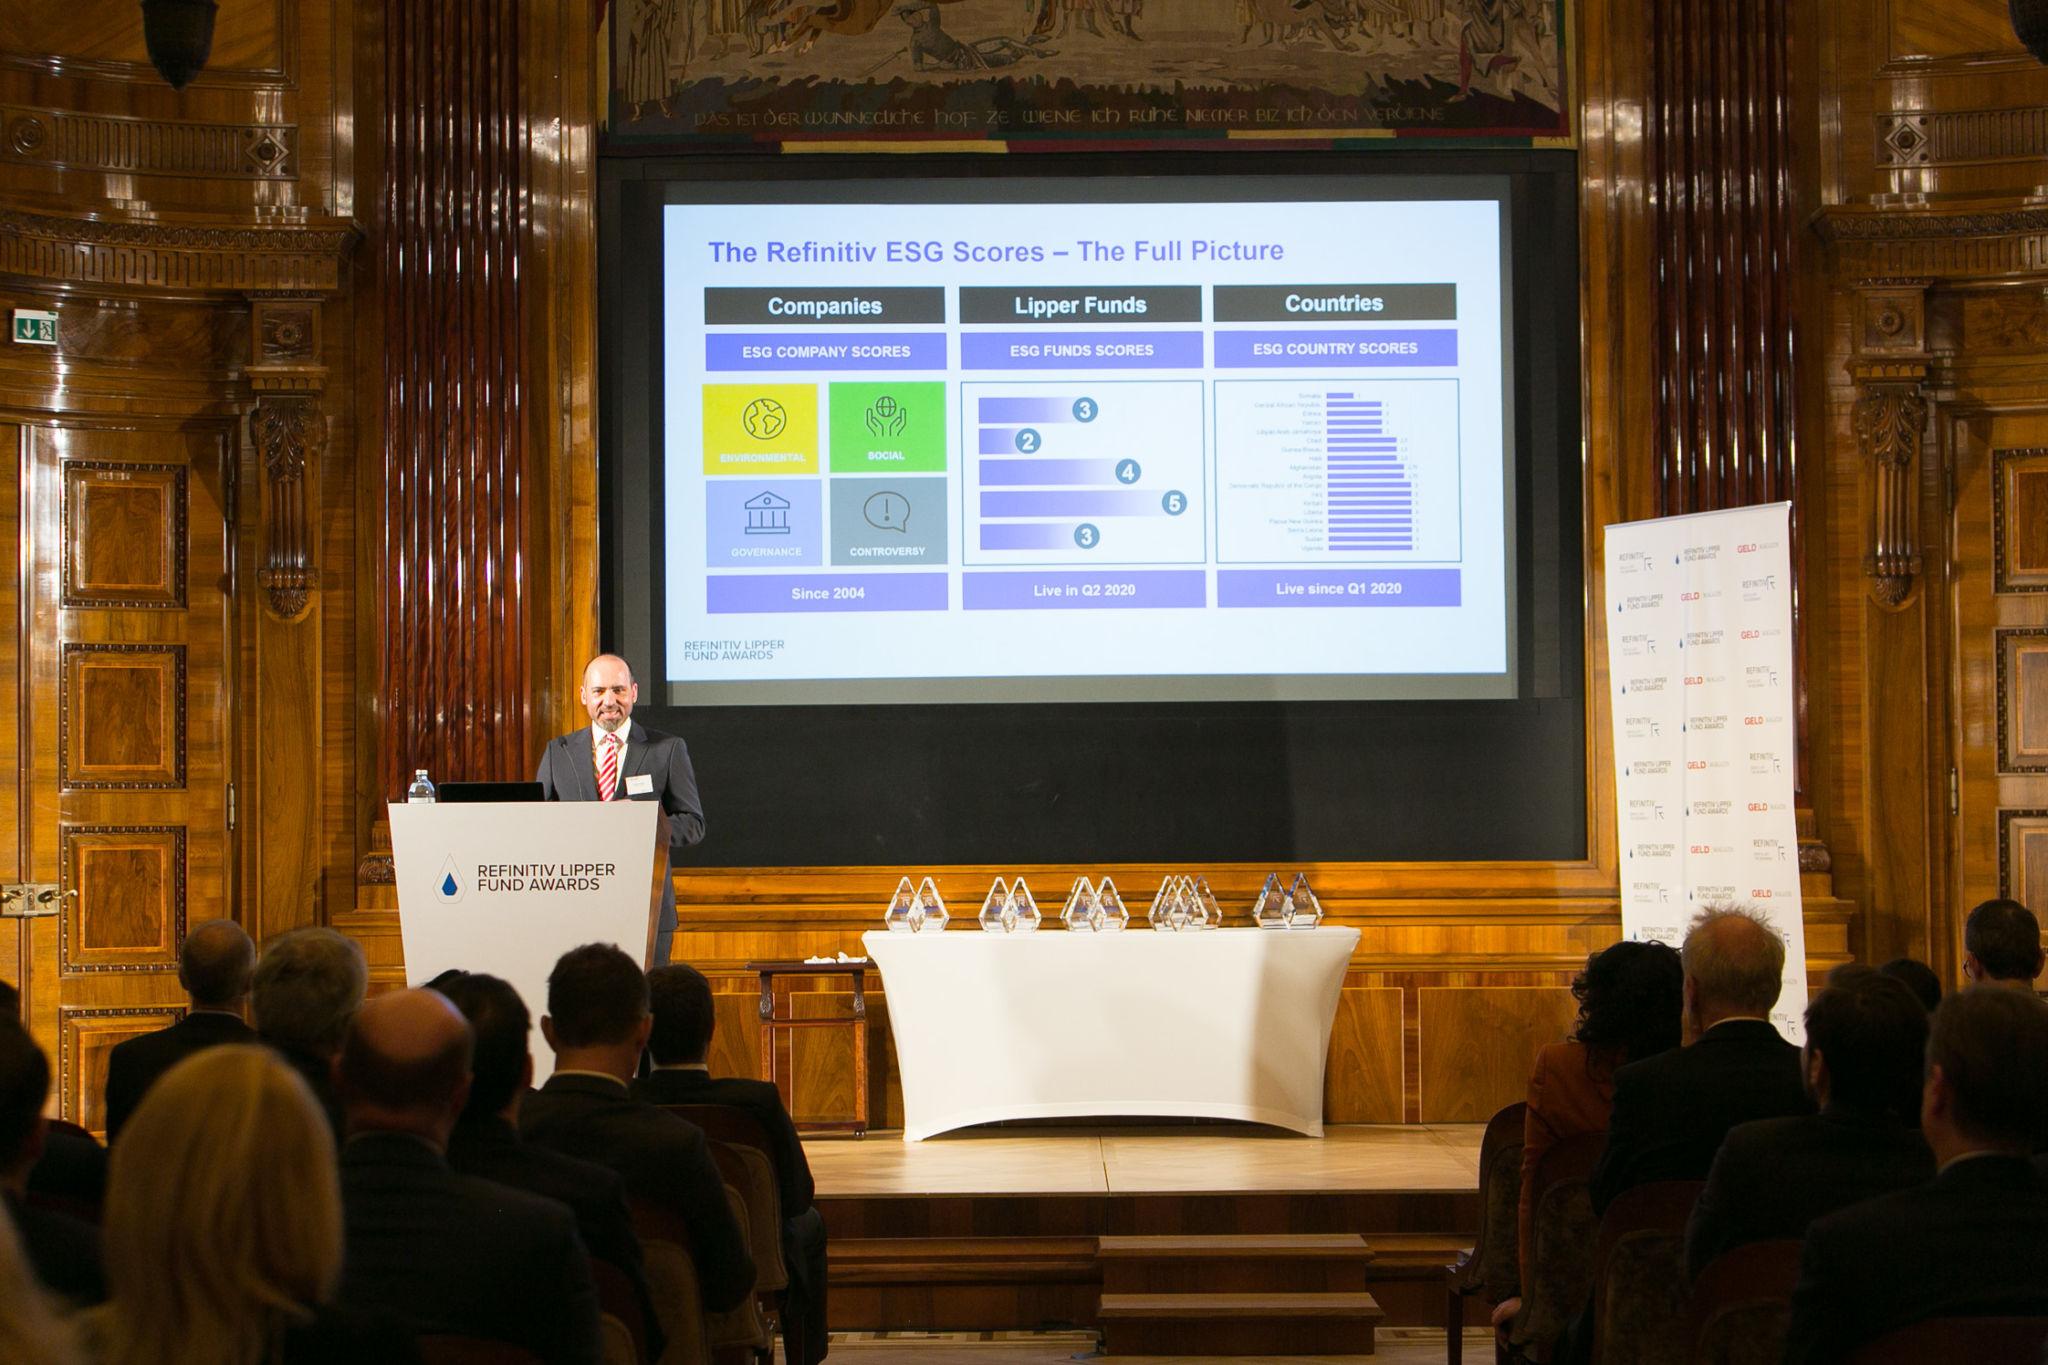 Johann Leikert, Sales Director CEE/CIS, Refinitiv presents the full picture of The Refinitiv ESG Scores.